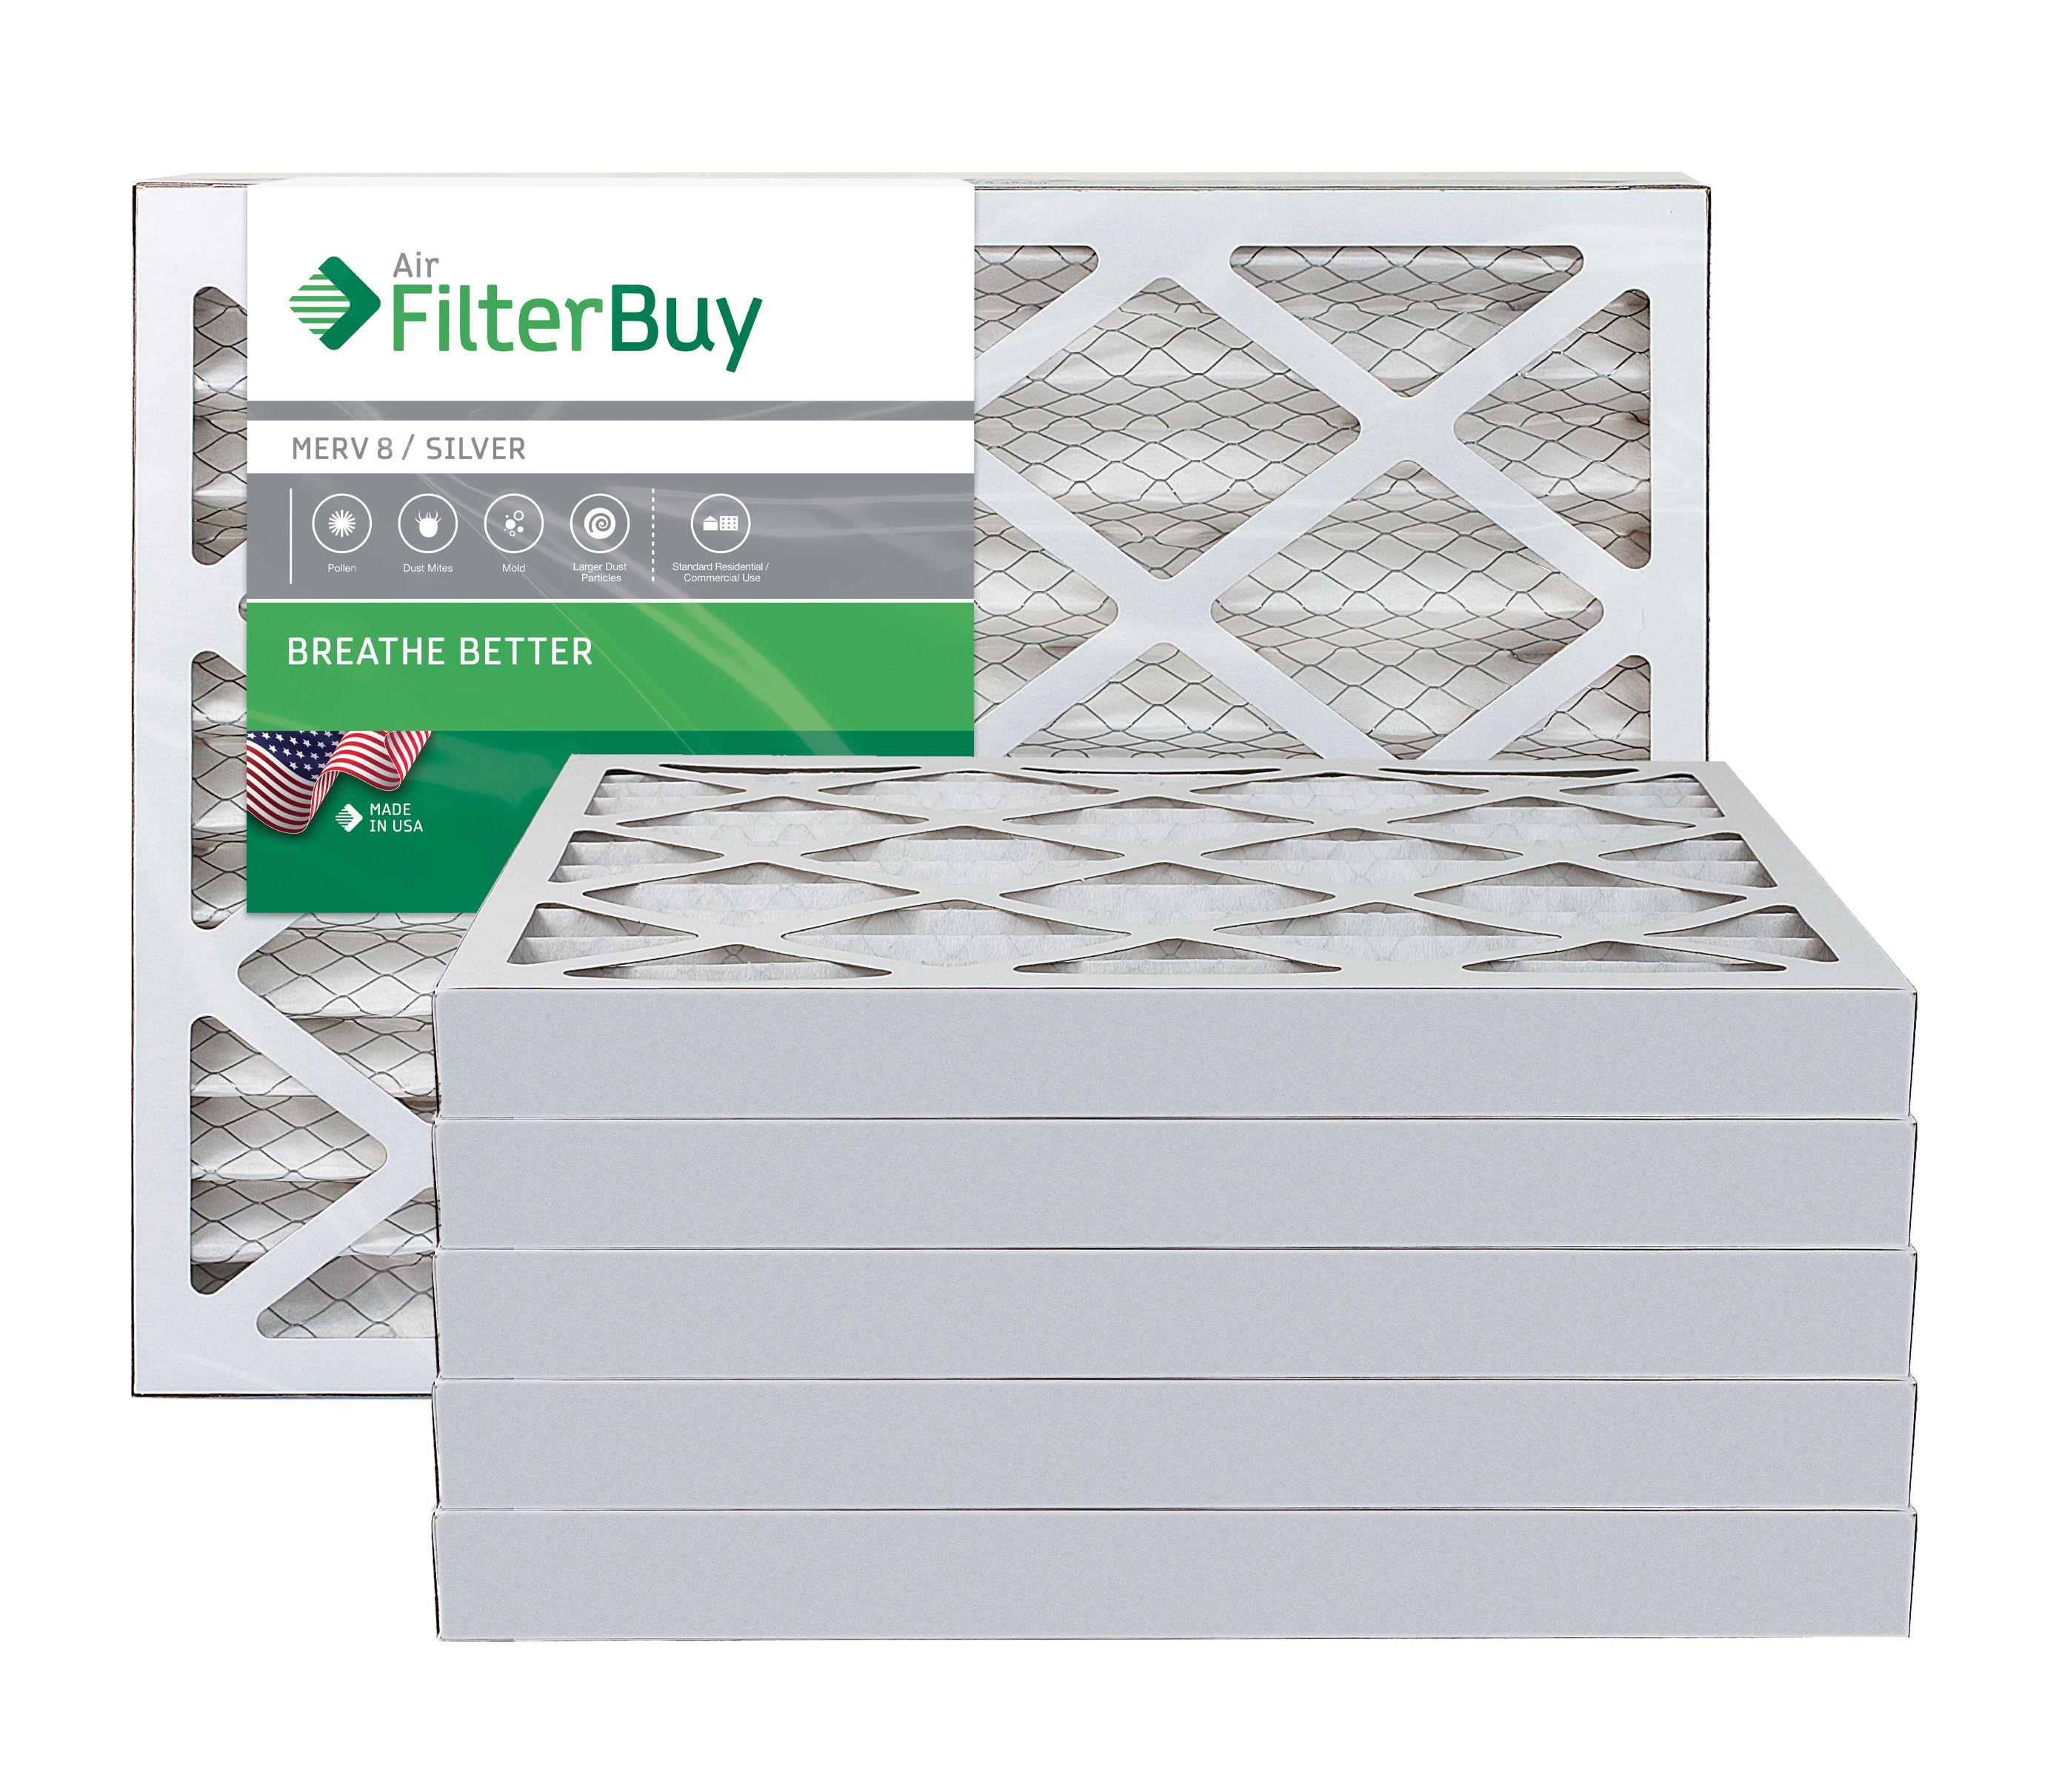 Actual Size Accumulair Diamond 16x21.5x1 MERV 13 Air Filter//Furnace Filters 2 Pack